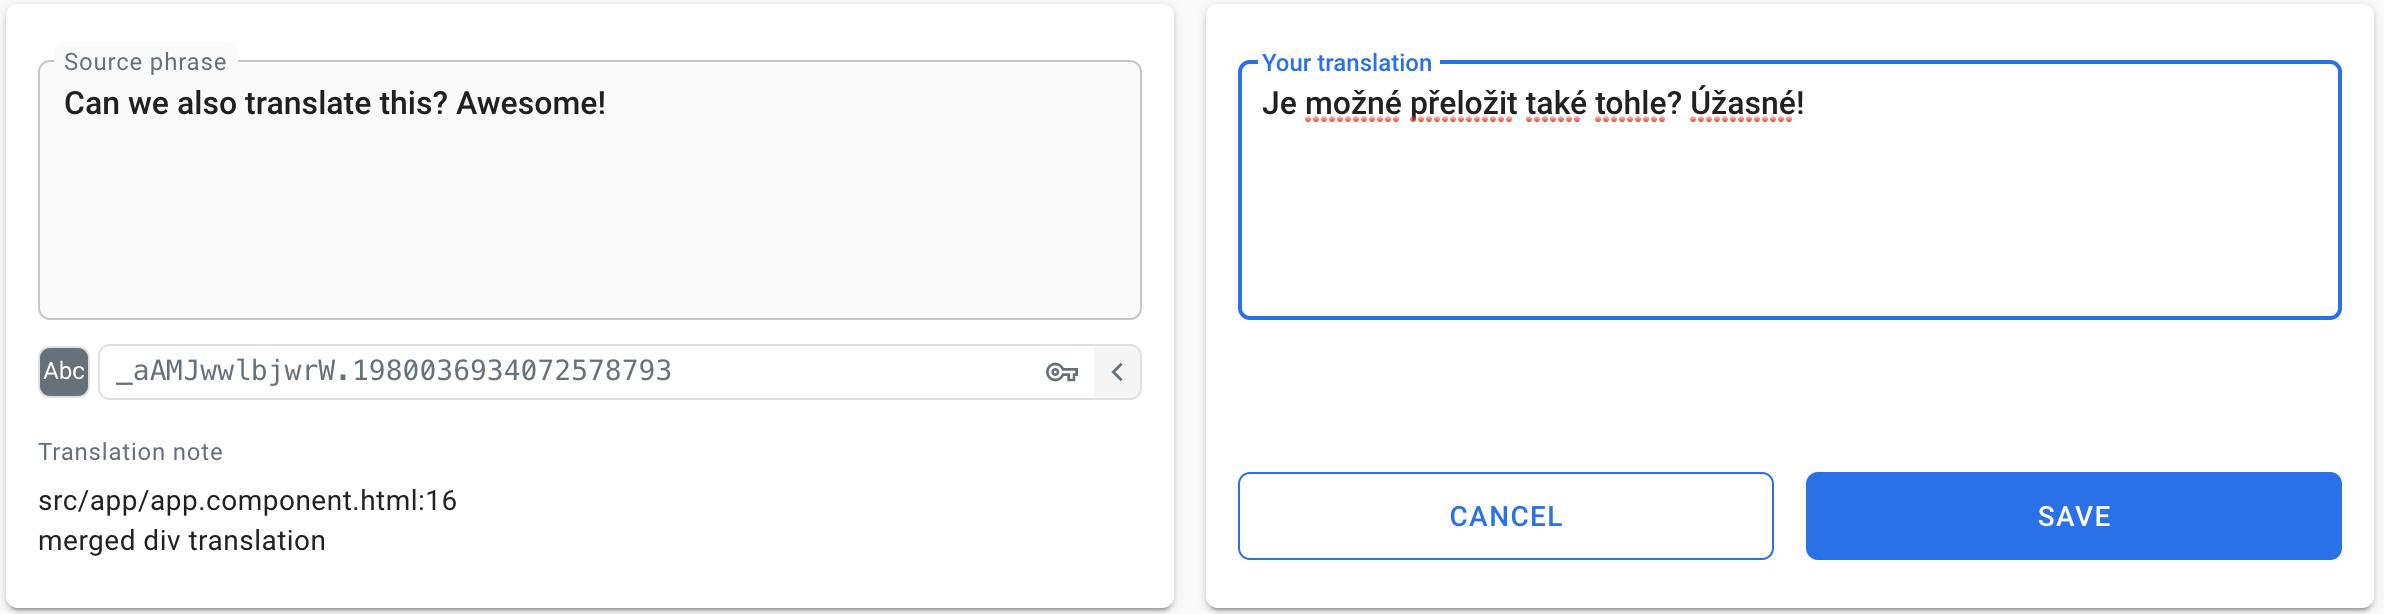 Translate phrase